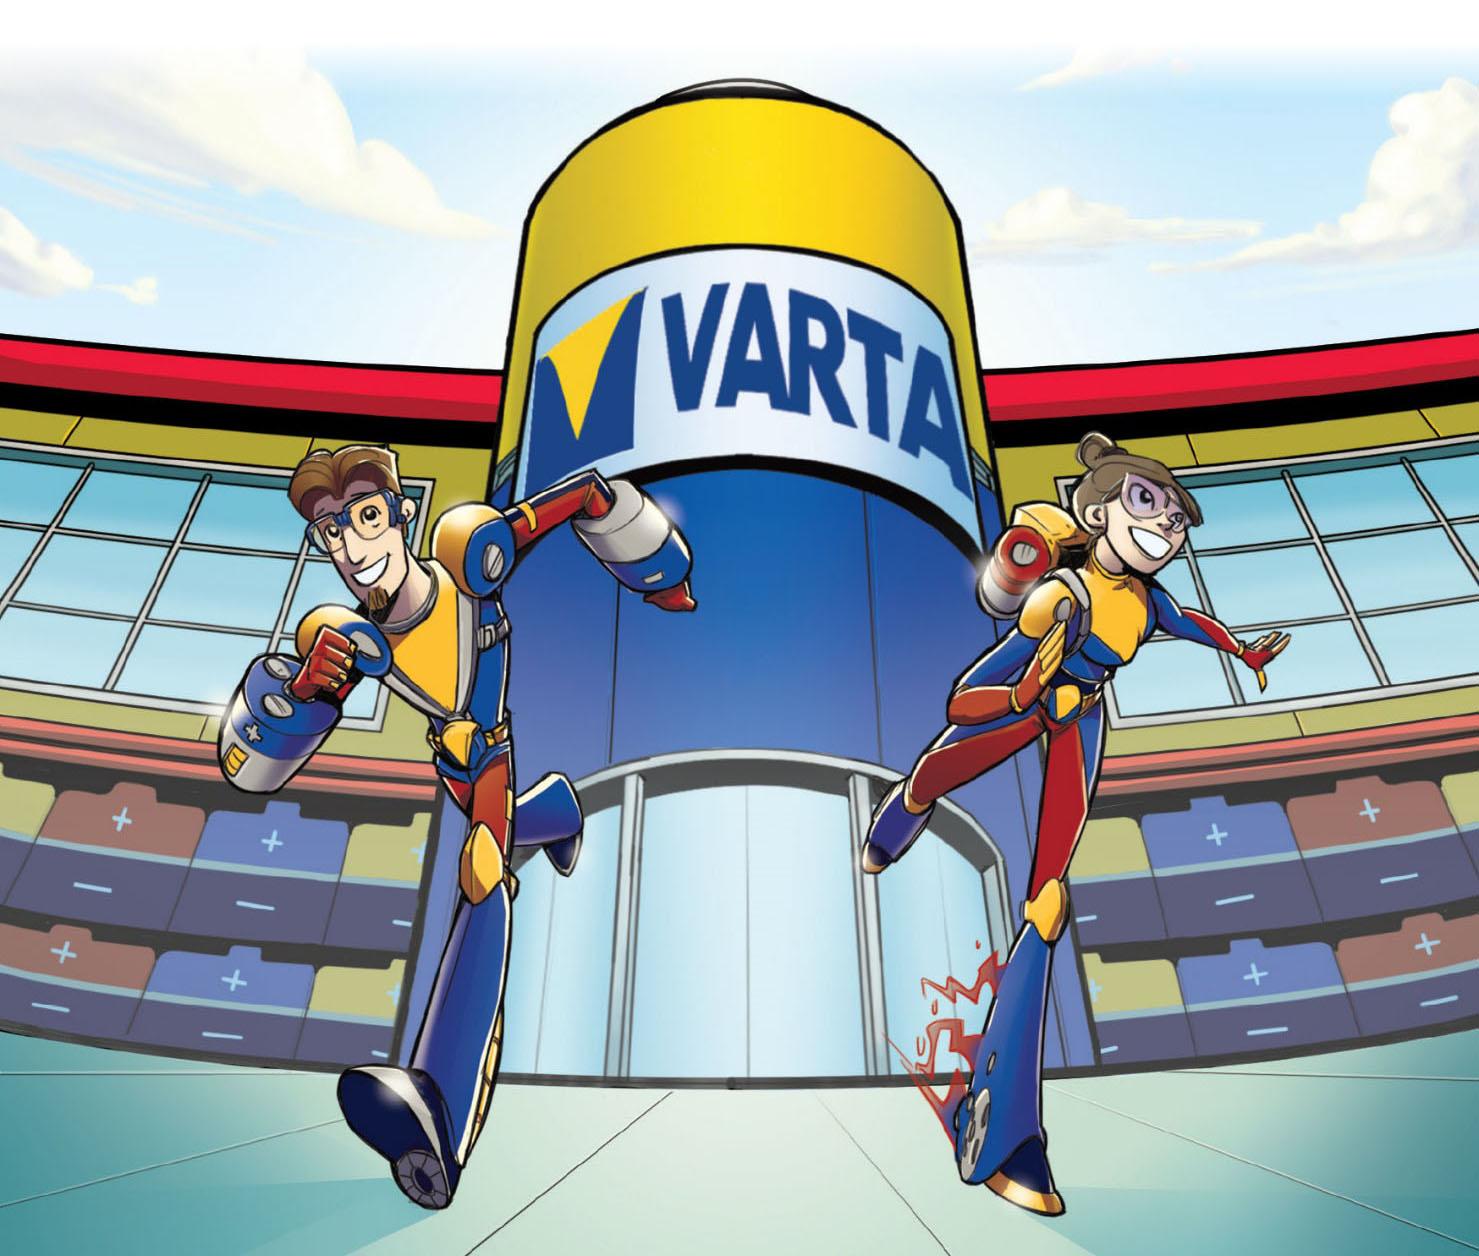 Varta presenta 'I Vartakidz - Salviamo l'ambiente pila per pila' thumbnail